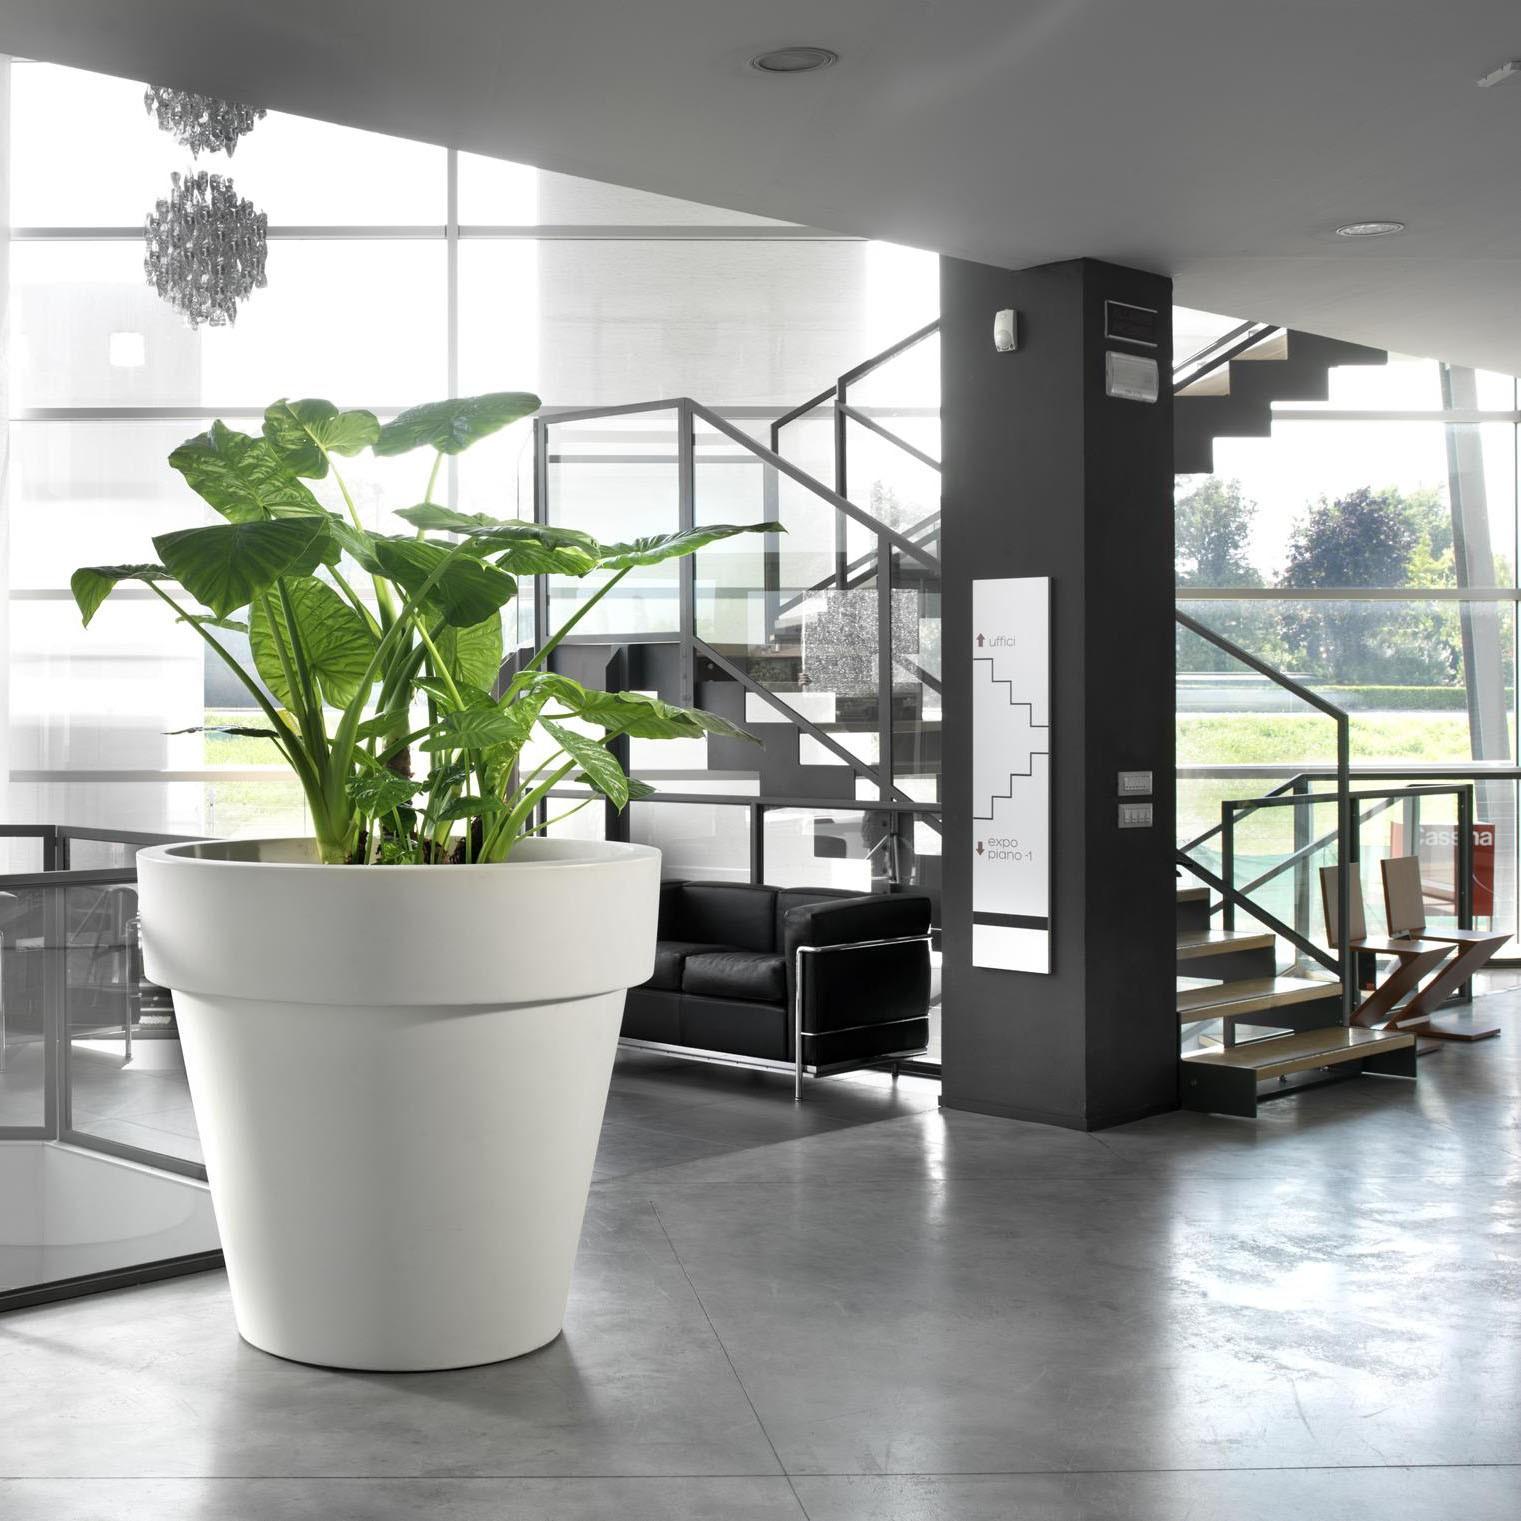 Vaso esterno grandi dimensioni standard one vendita online for Vasi in terracotta on line